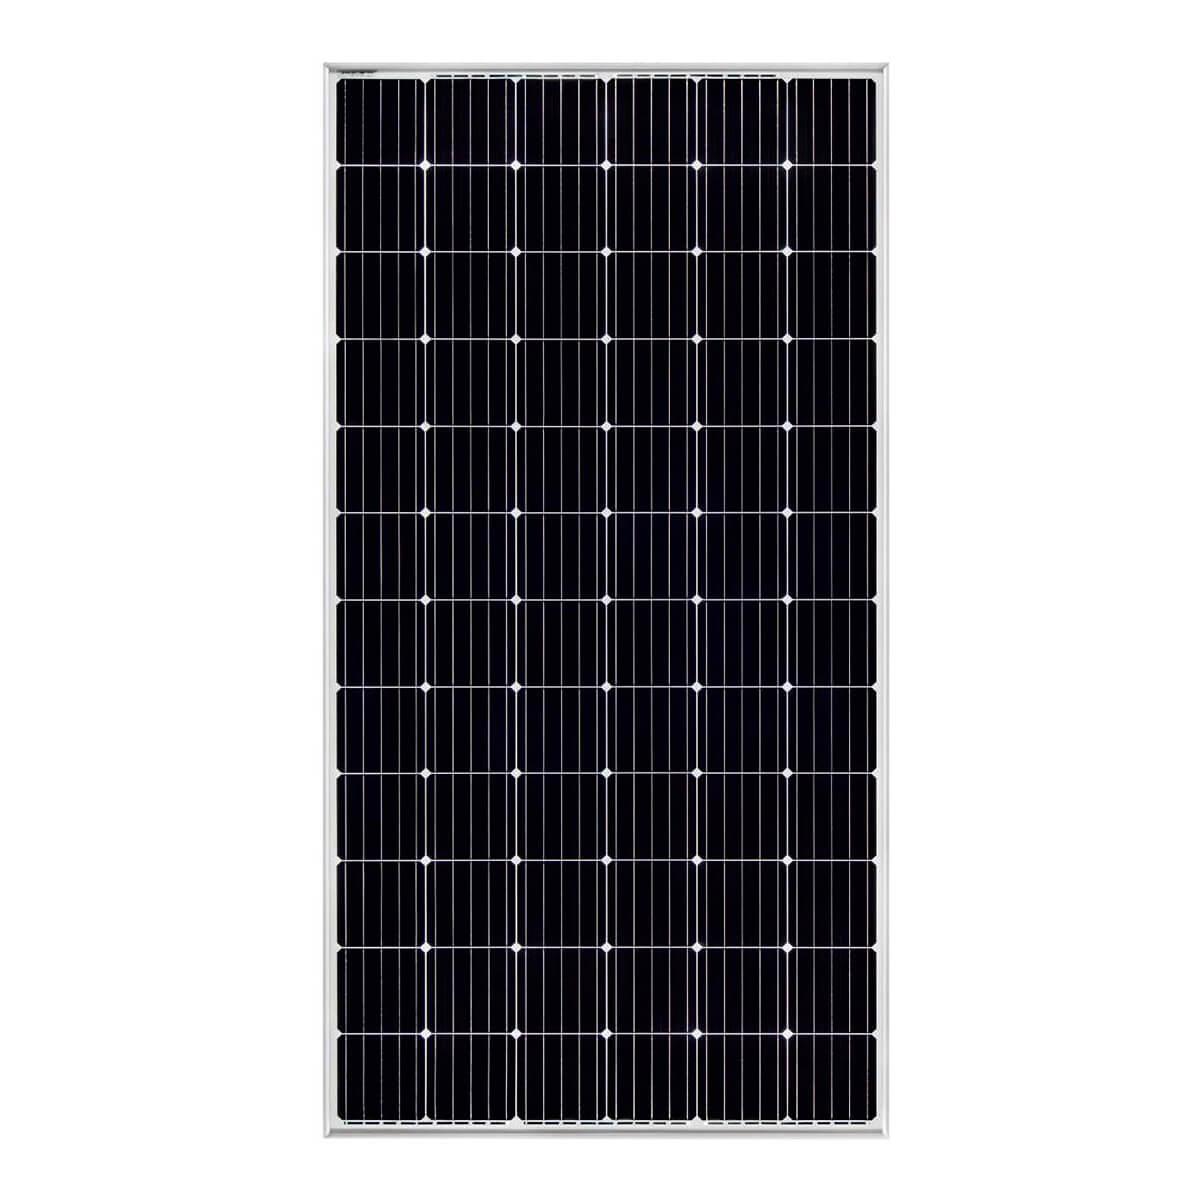 Odul solar 365W panel, odul solar 365Watt panel, Odul solar 365 W panel, odul solar 365 Watt panel, odul solar 365 Watt monokristal panel, Odul solar 365 W watt gunes paneli, odul solar 365 W watt monokristal gunes paneli, odul solar 365 W Watt fotovoltaik monokristal solar panel, odul solar 365W monokristal gunes enerjisi, odul solar OSM72-365W panel, ÖDÜL SOLAR 365 WATT